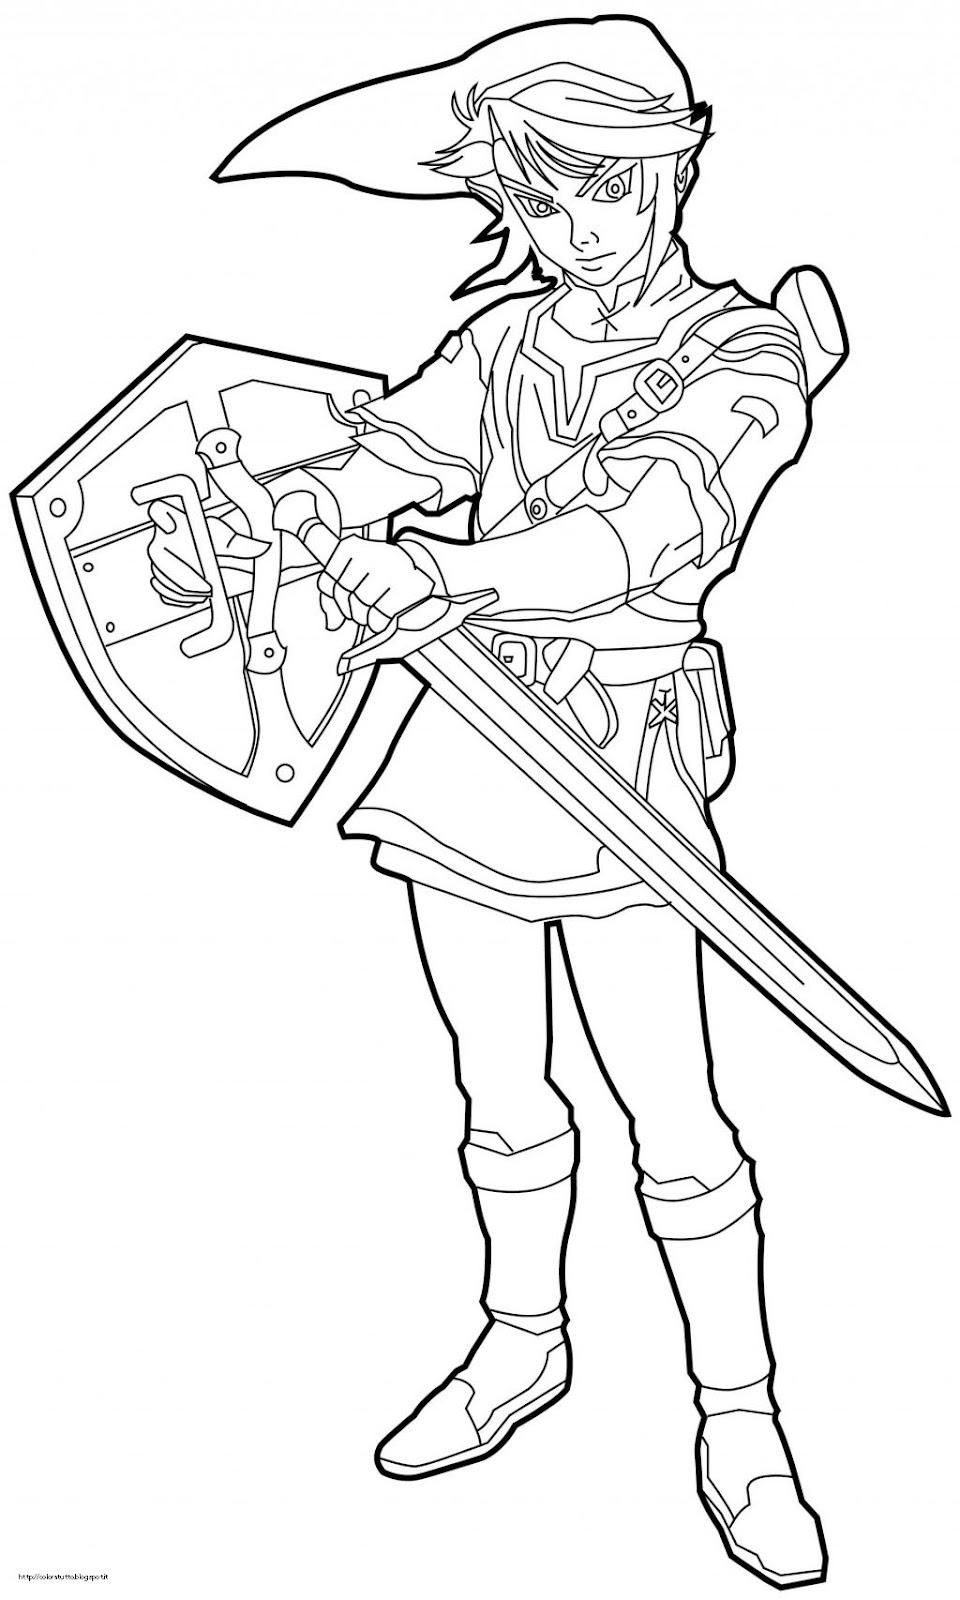 Giugno 2012 for Zelda coloring page